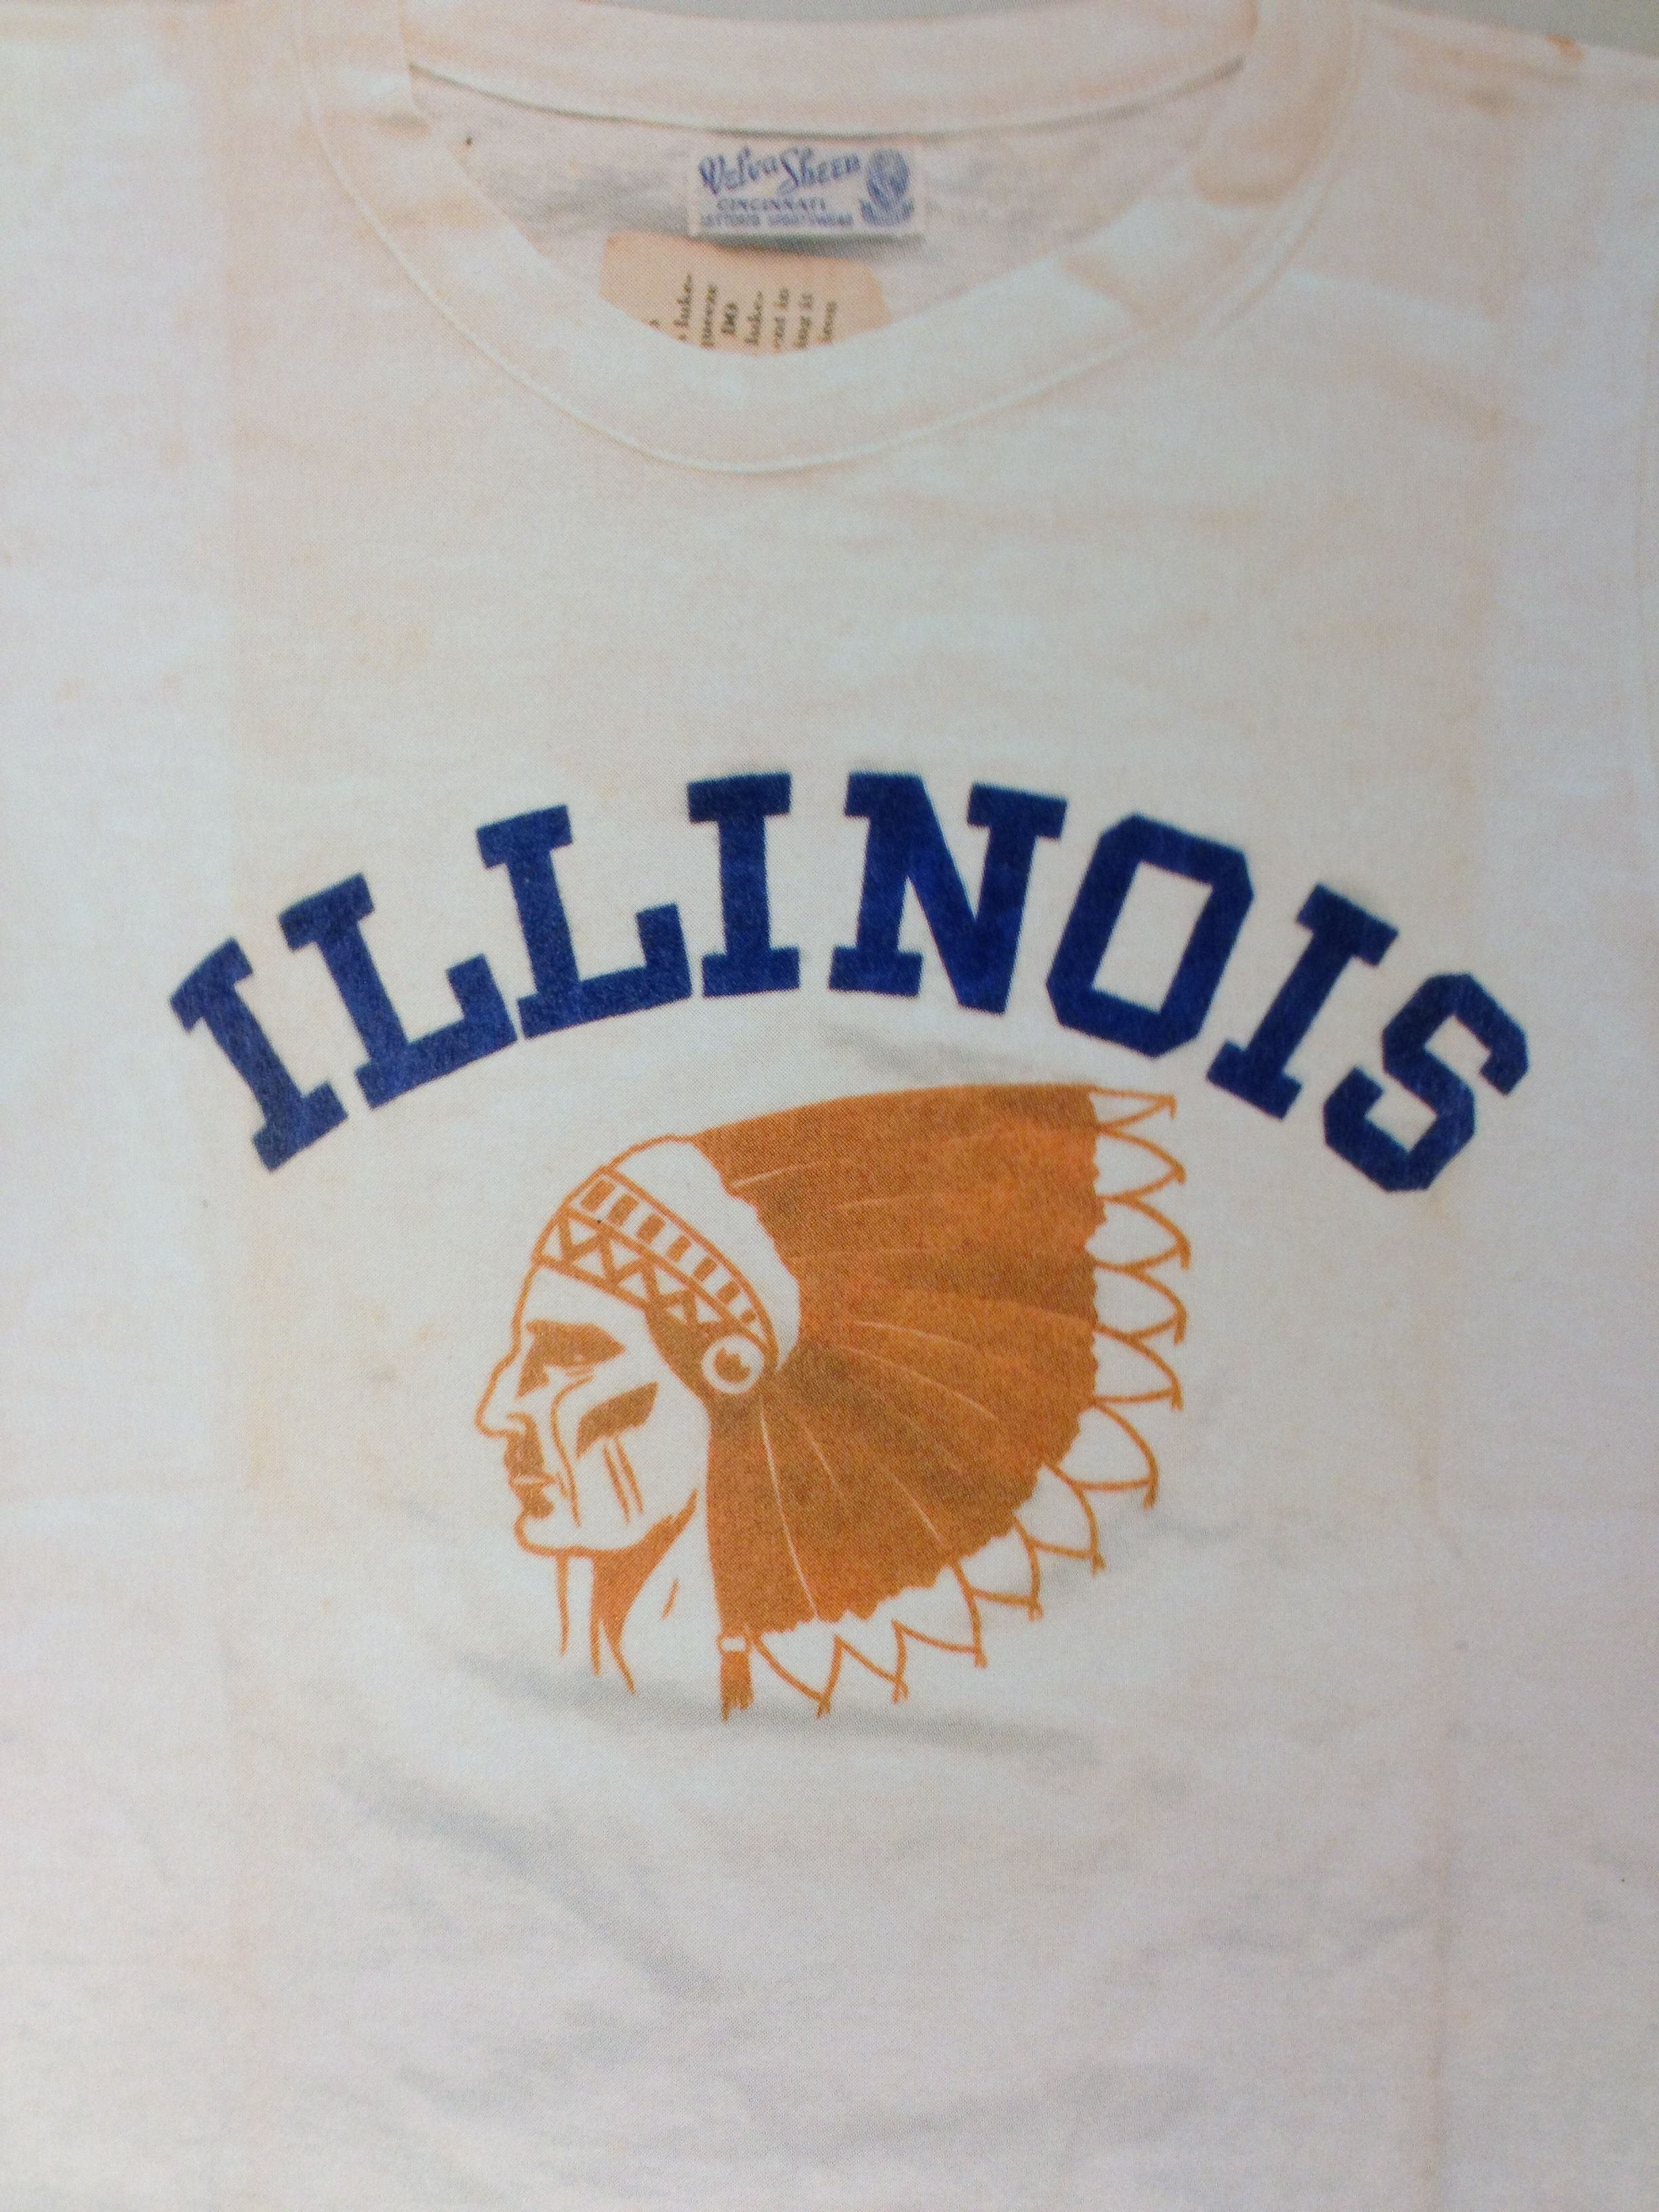 9dceb51e6 CLEVELAND BROWNS 80s Vintage Jersey  Rare Original USA Made Champion 1980s Football  Jersey  Dawg Pou